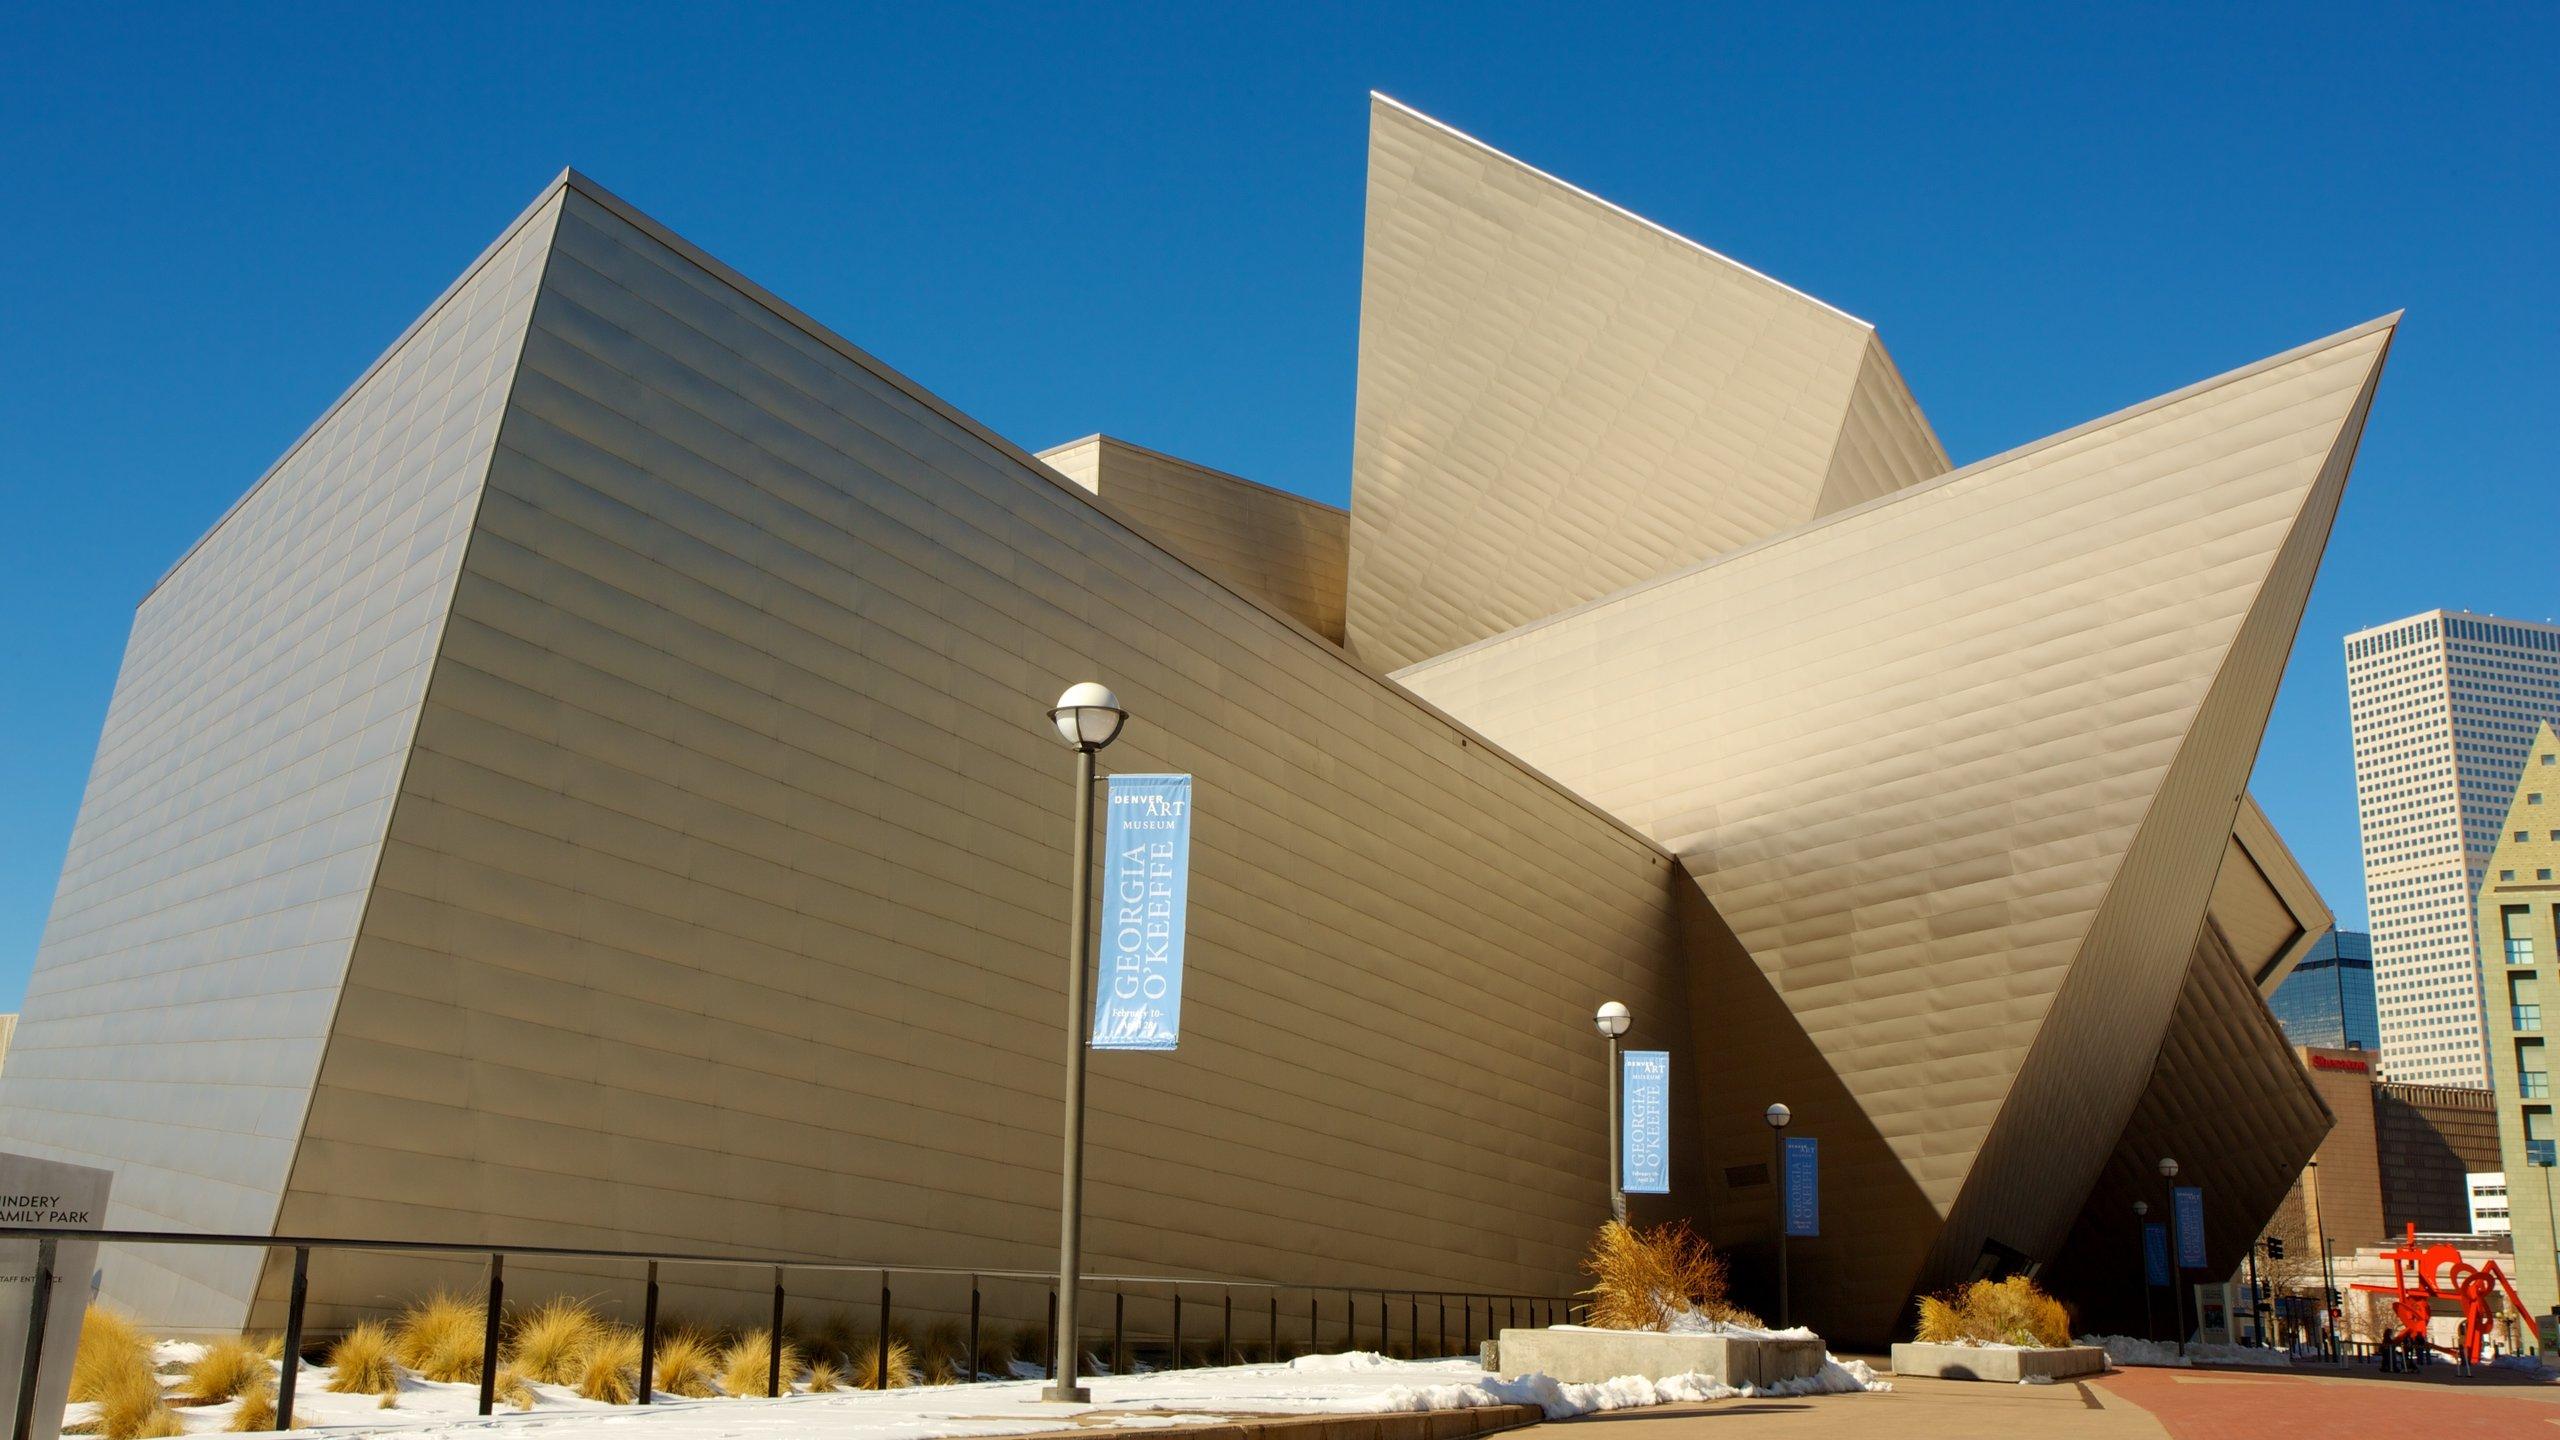 Museo de Arte de Denver, Denver, Colorado, Estados Unidos